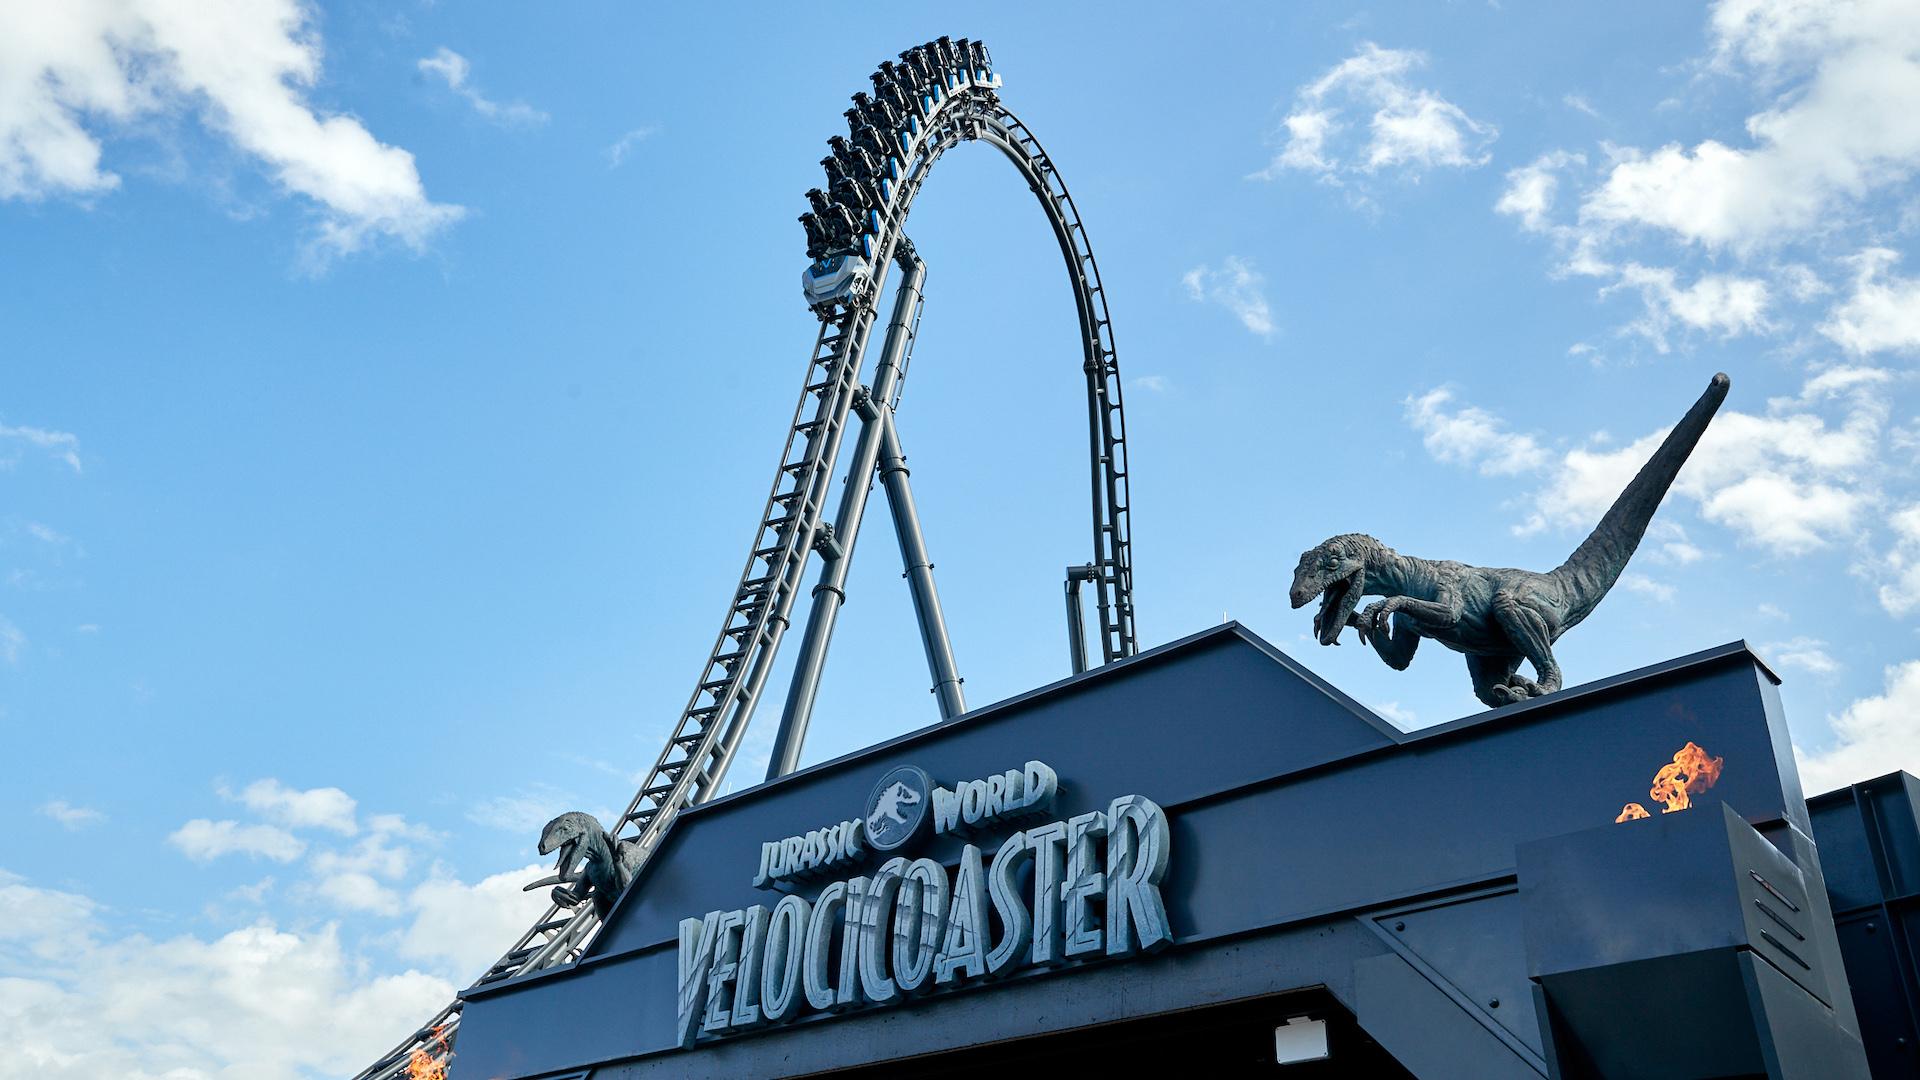 Inaugura la montaña rusa más alta de Florida: Jurassic World VelociCoaster